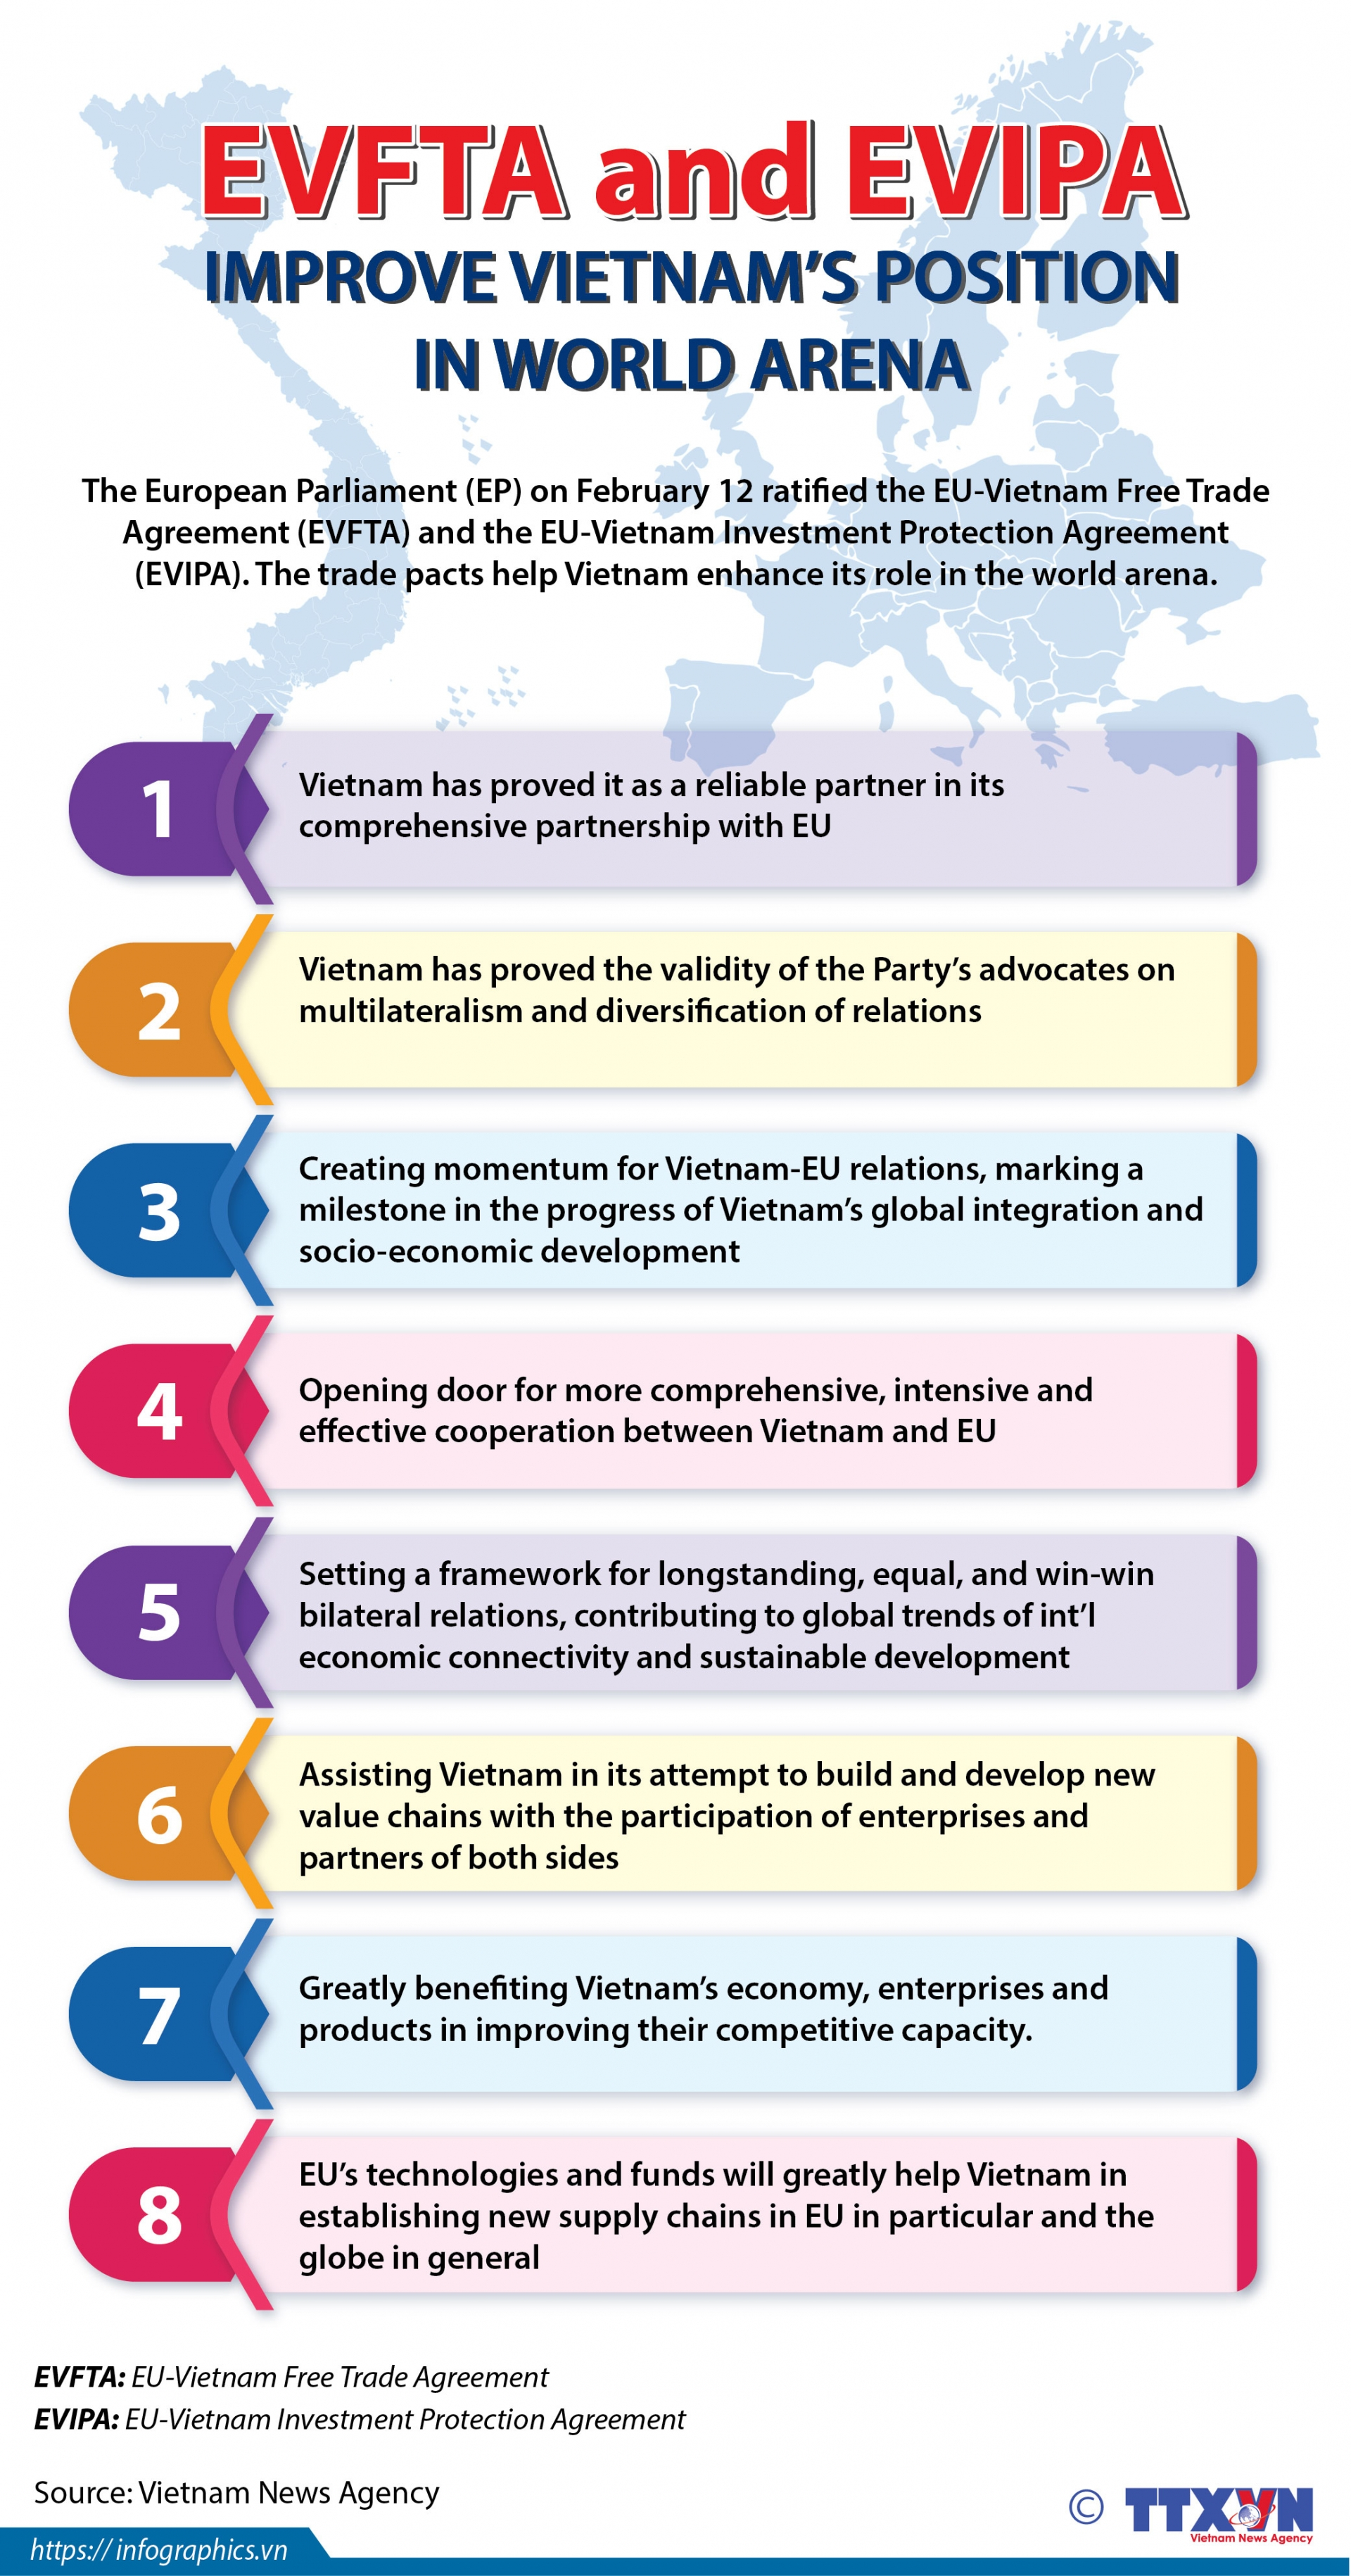 evfta evipa improve vietnams position in world arena infographics